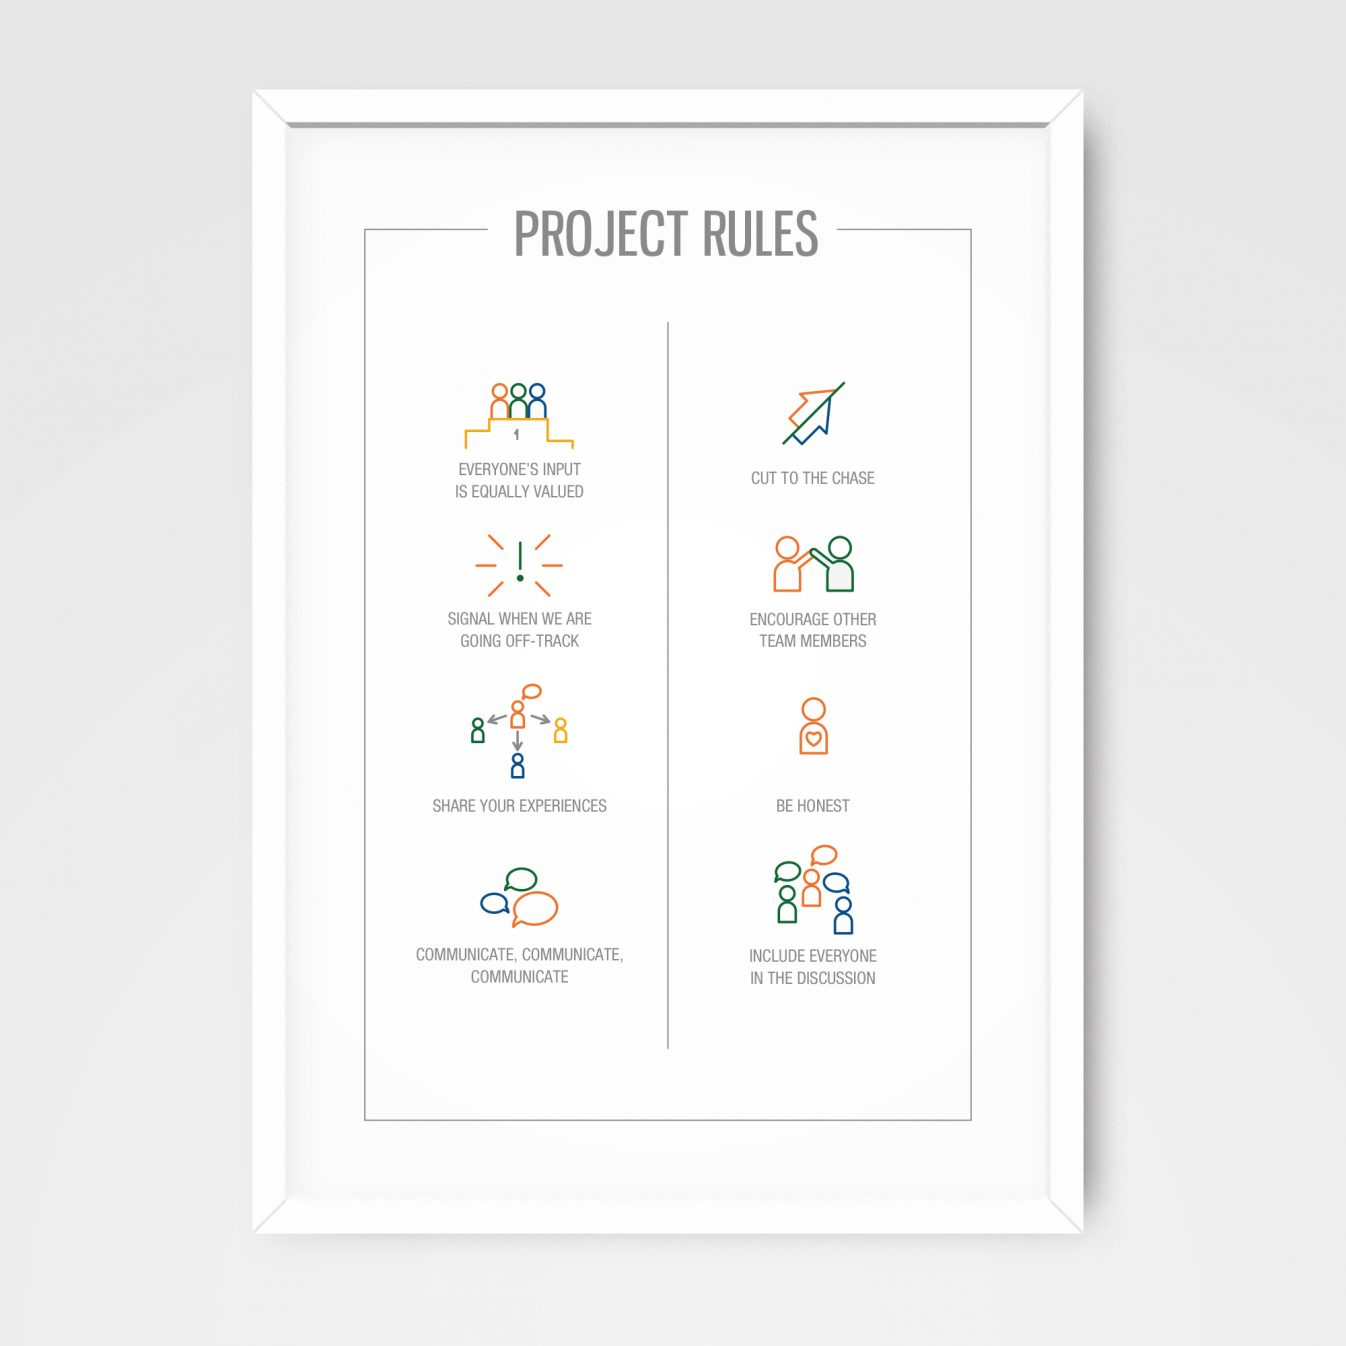 BancaIntesa_GraphicDesign_Shonski_Pictograms_Poster_ProjectRules1